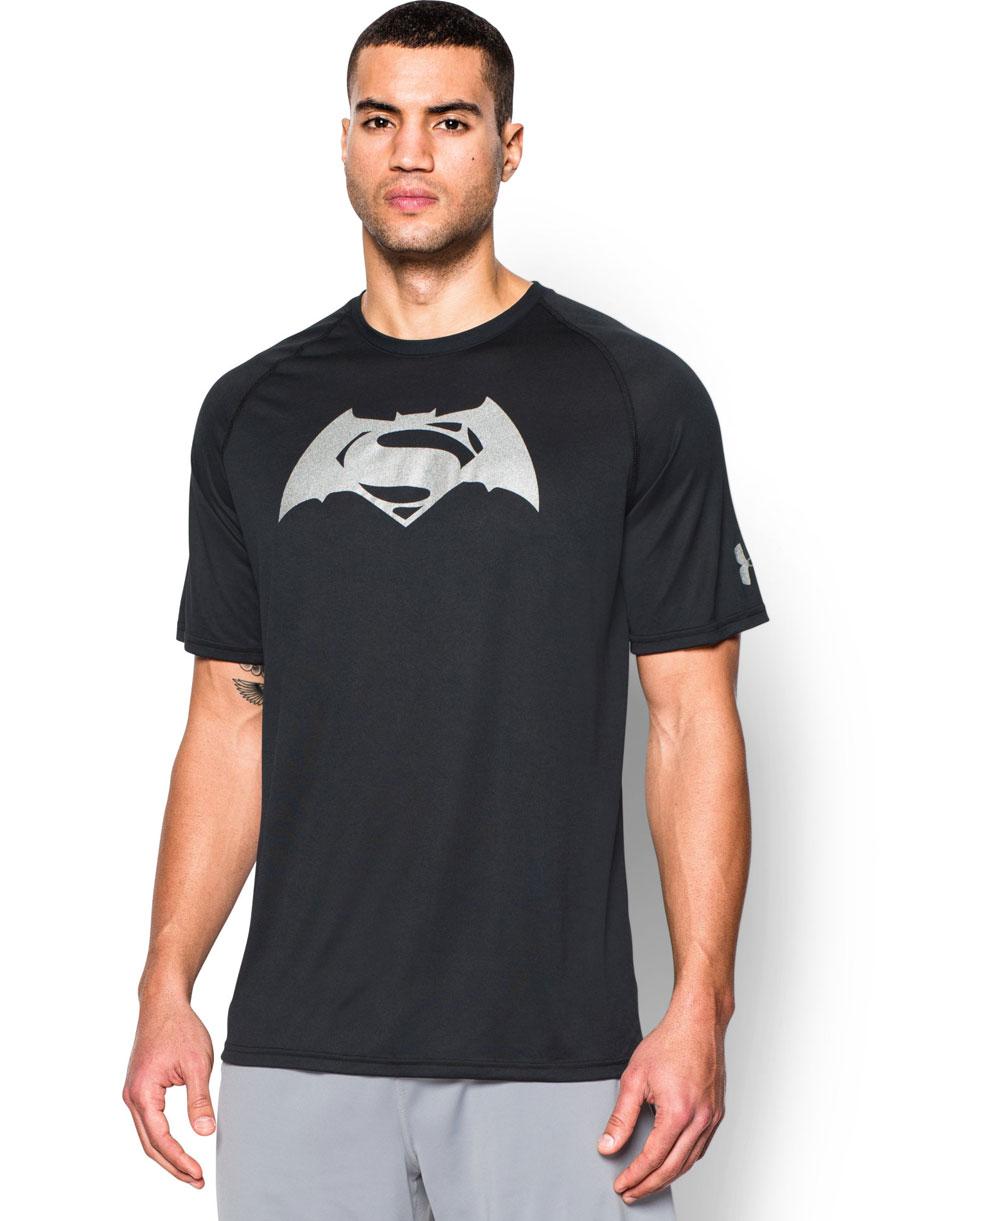 Afholte Under Armour Men's Short Sleeve T-Shirt Alter Ego Batman Vs Superma... OH-79